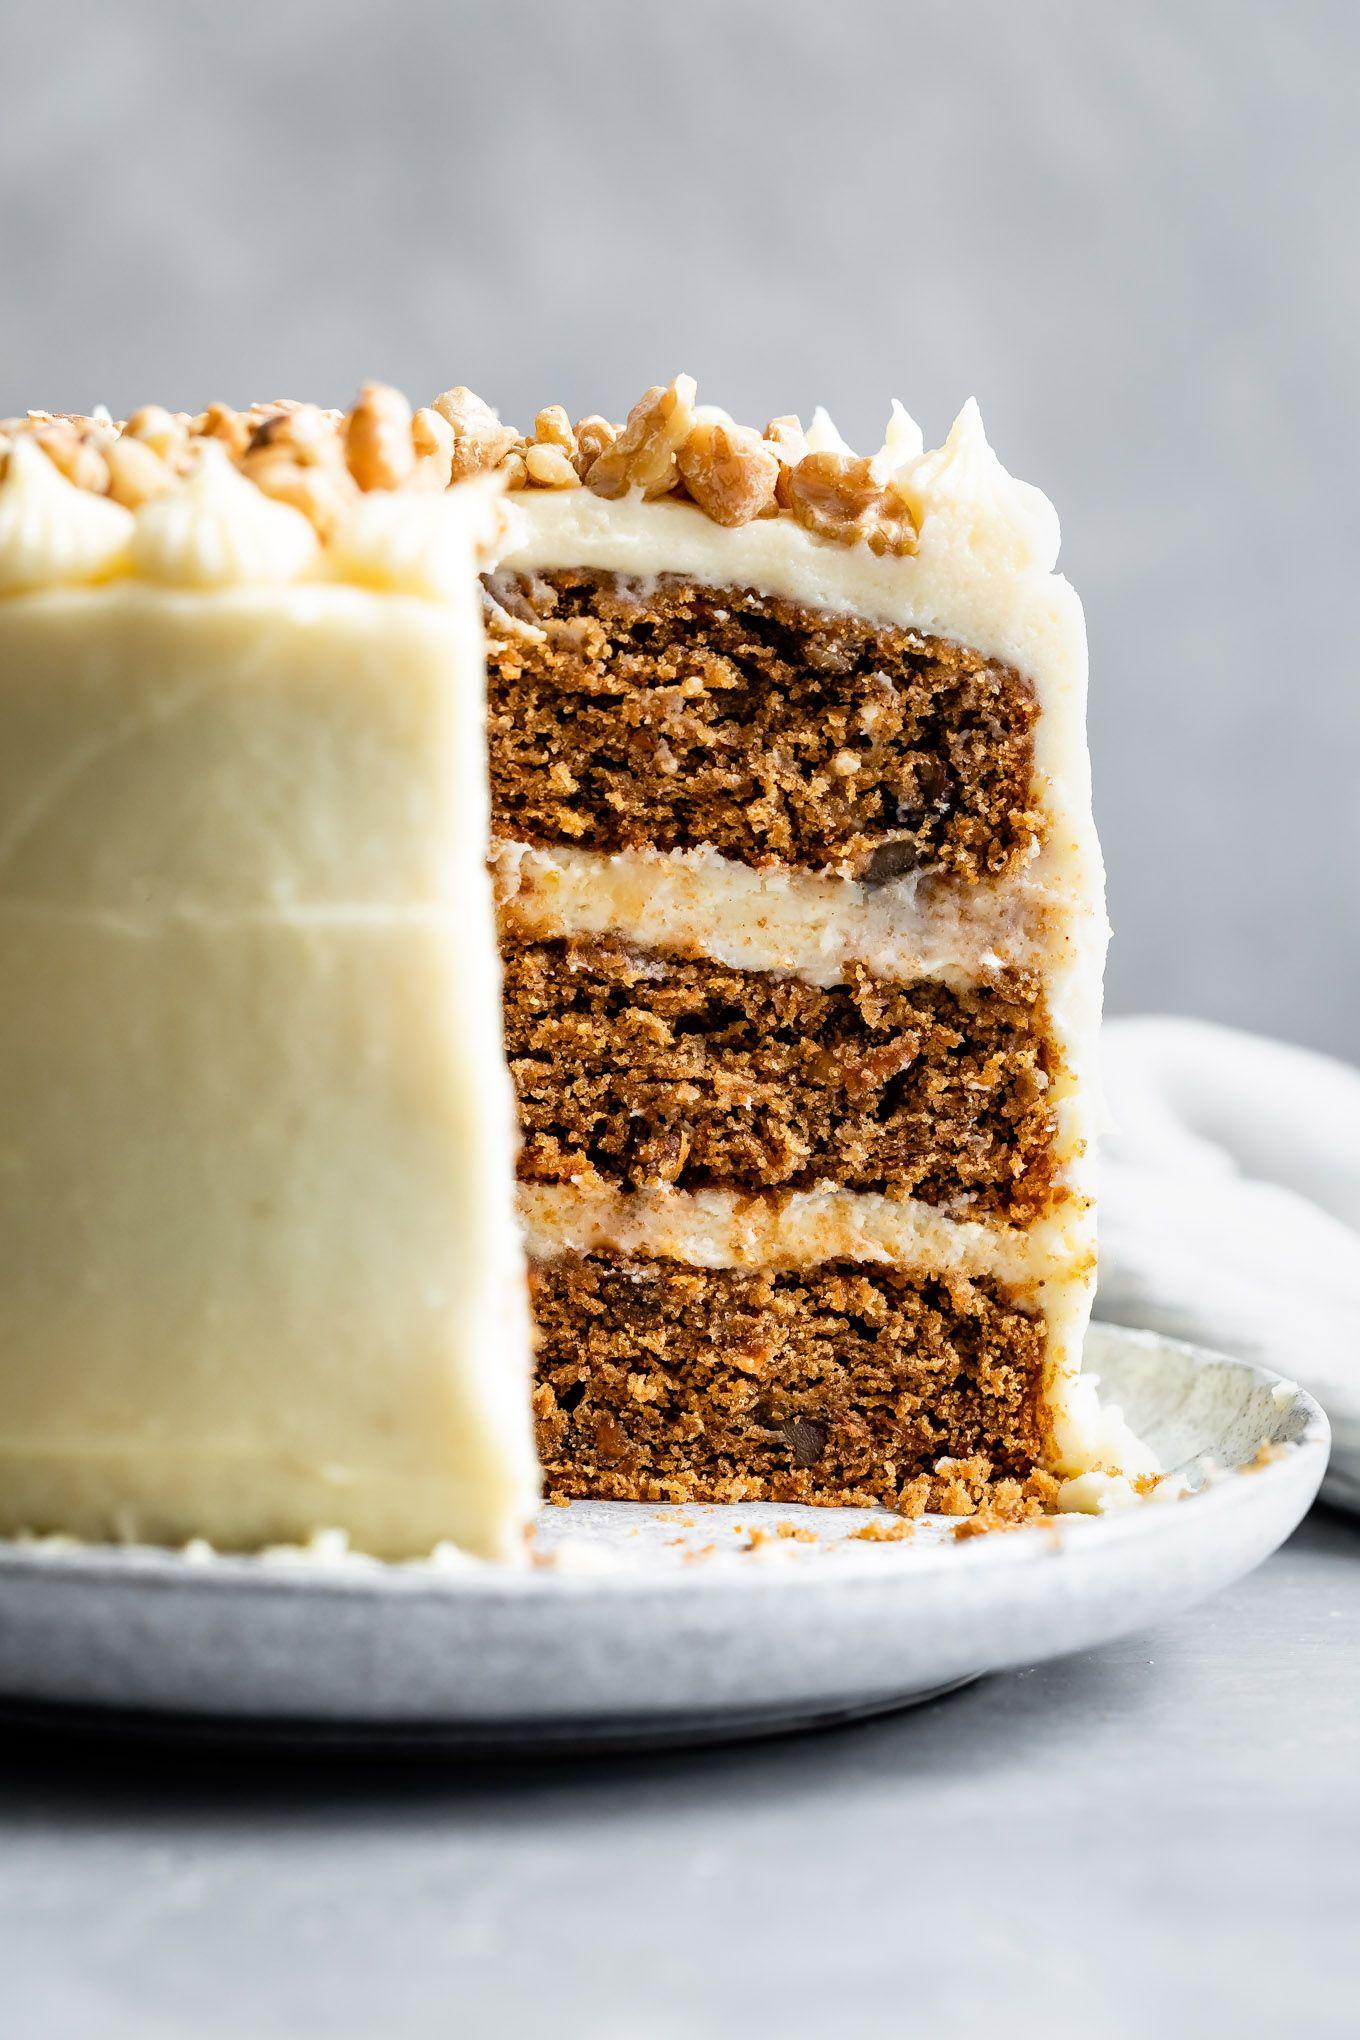 Gluten Free Carrot Cake Recipe In 2020 Gluten Free Carrot Cake Dessert Recipes Carrot Cake